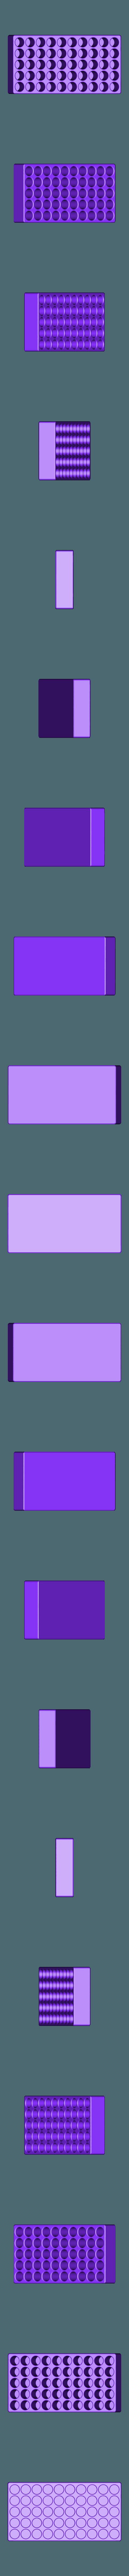 D60b1308 05d7 4014 92be c1111e28369c